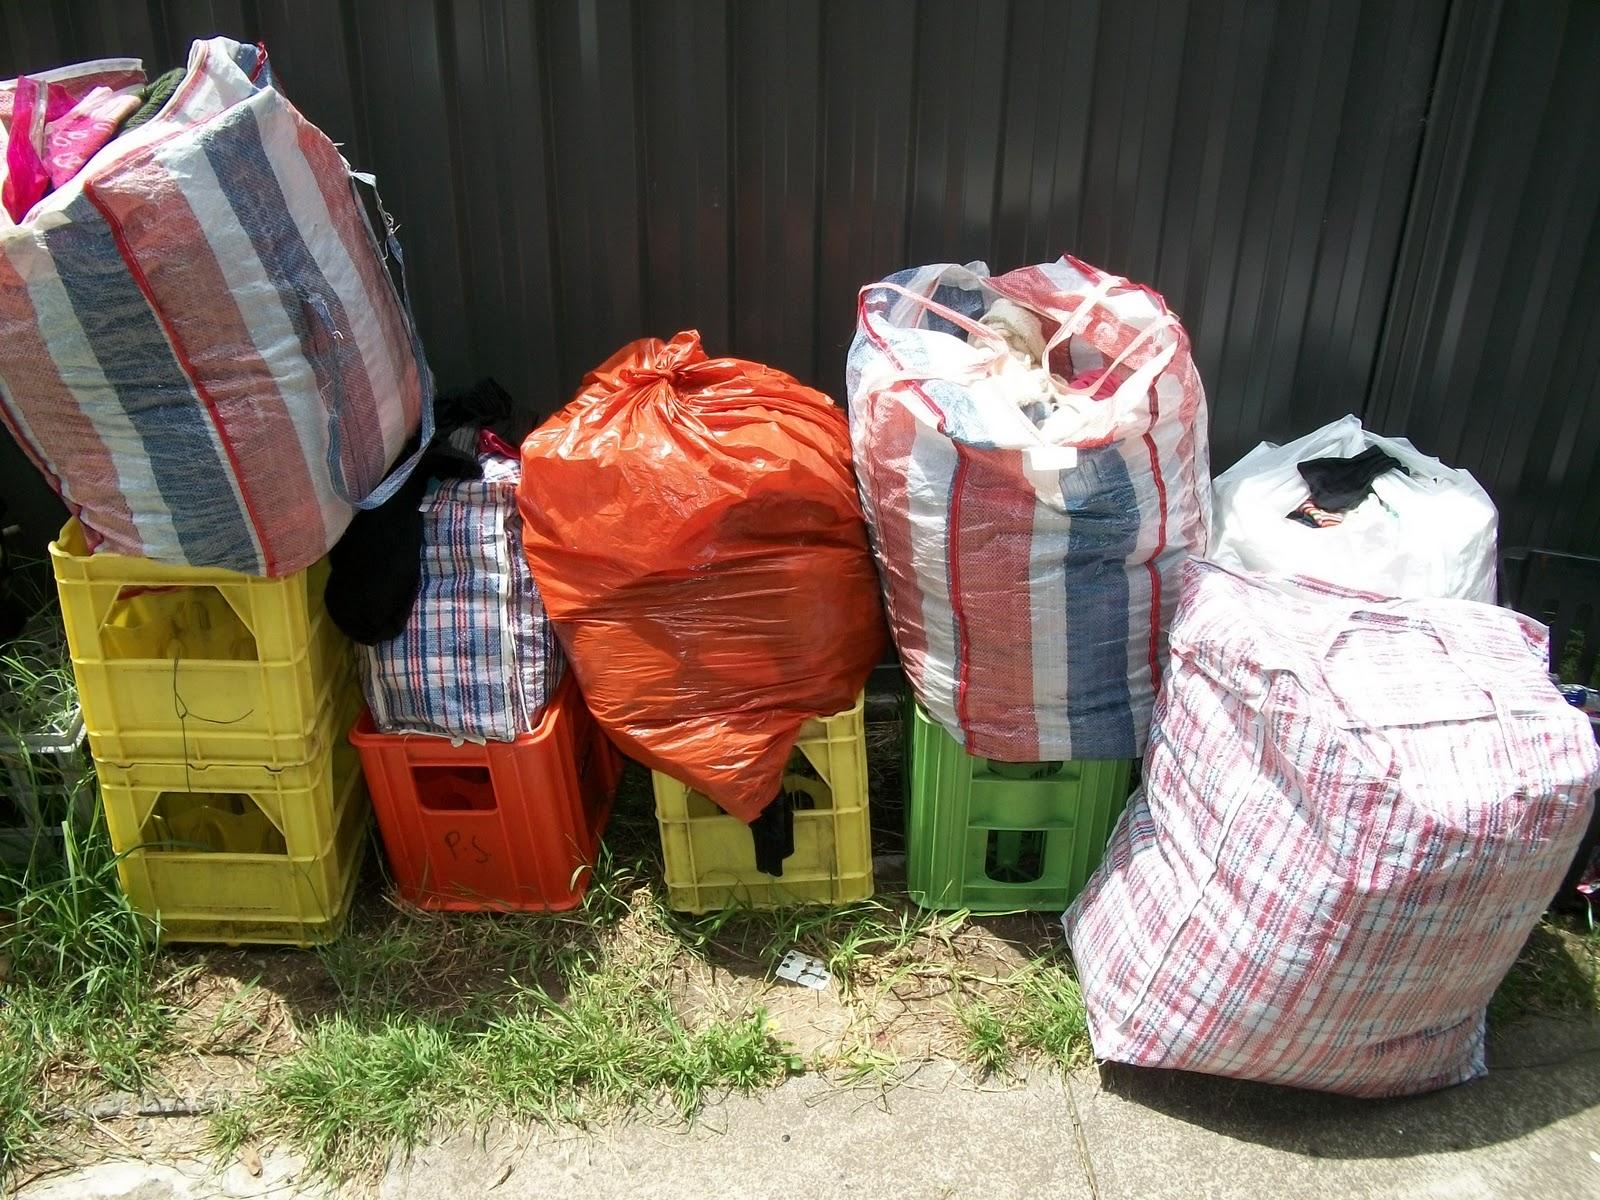 http://1.bp.blogspot.com/-JqcaQjhTbpo/TxvWjvm09BI/AAAAAAAAgjs/96aNhkUel4s/s1600/Salvaged+bags+of+clothes+01.JPG